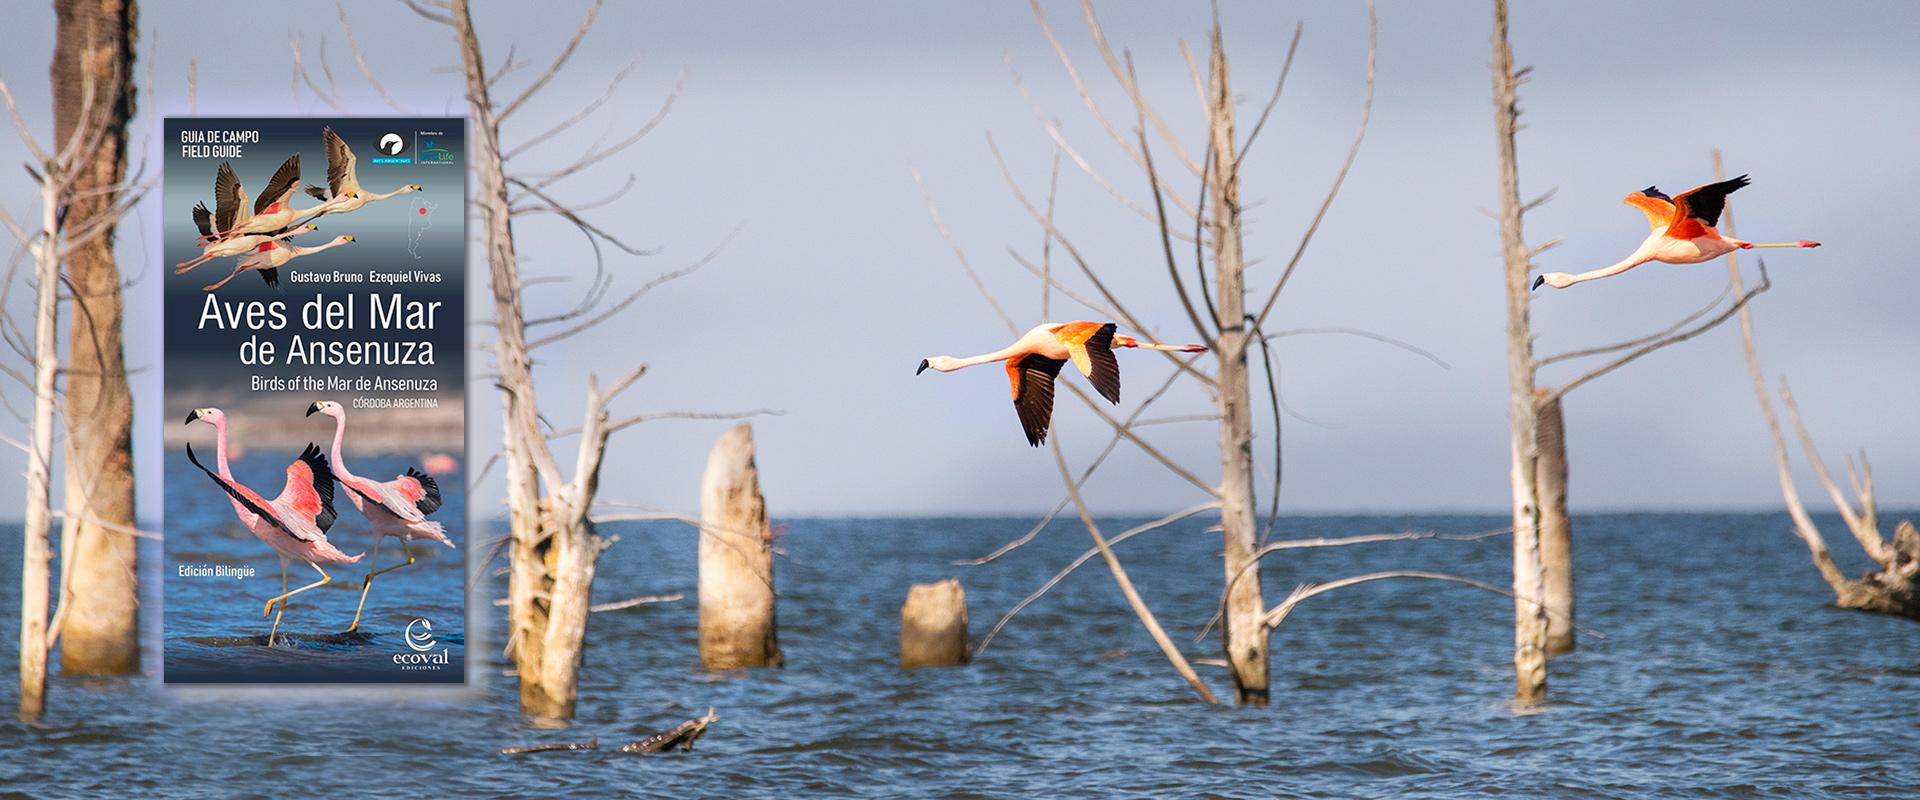 Aves Mar Chiquita